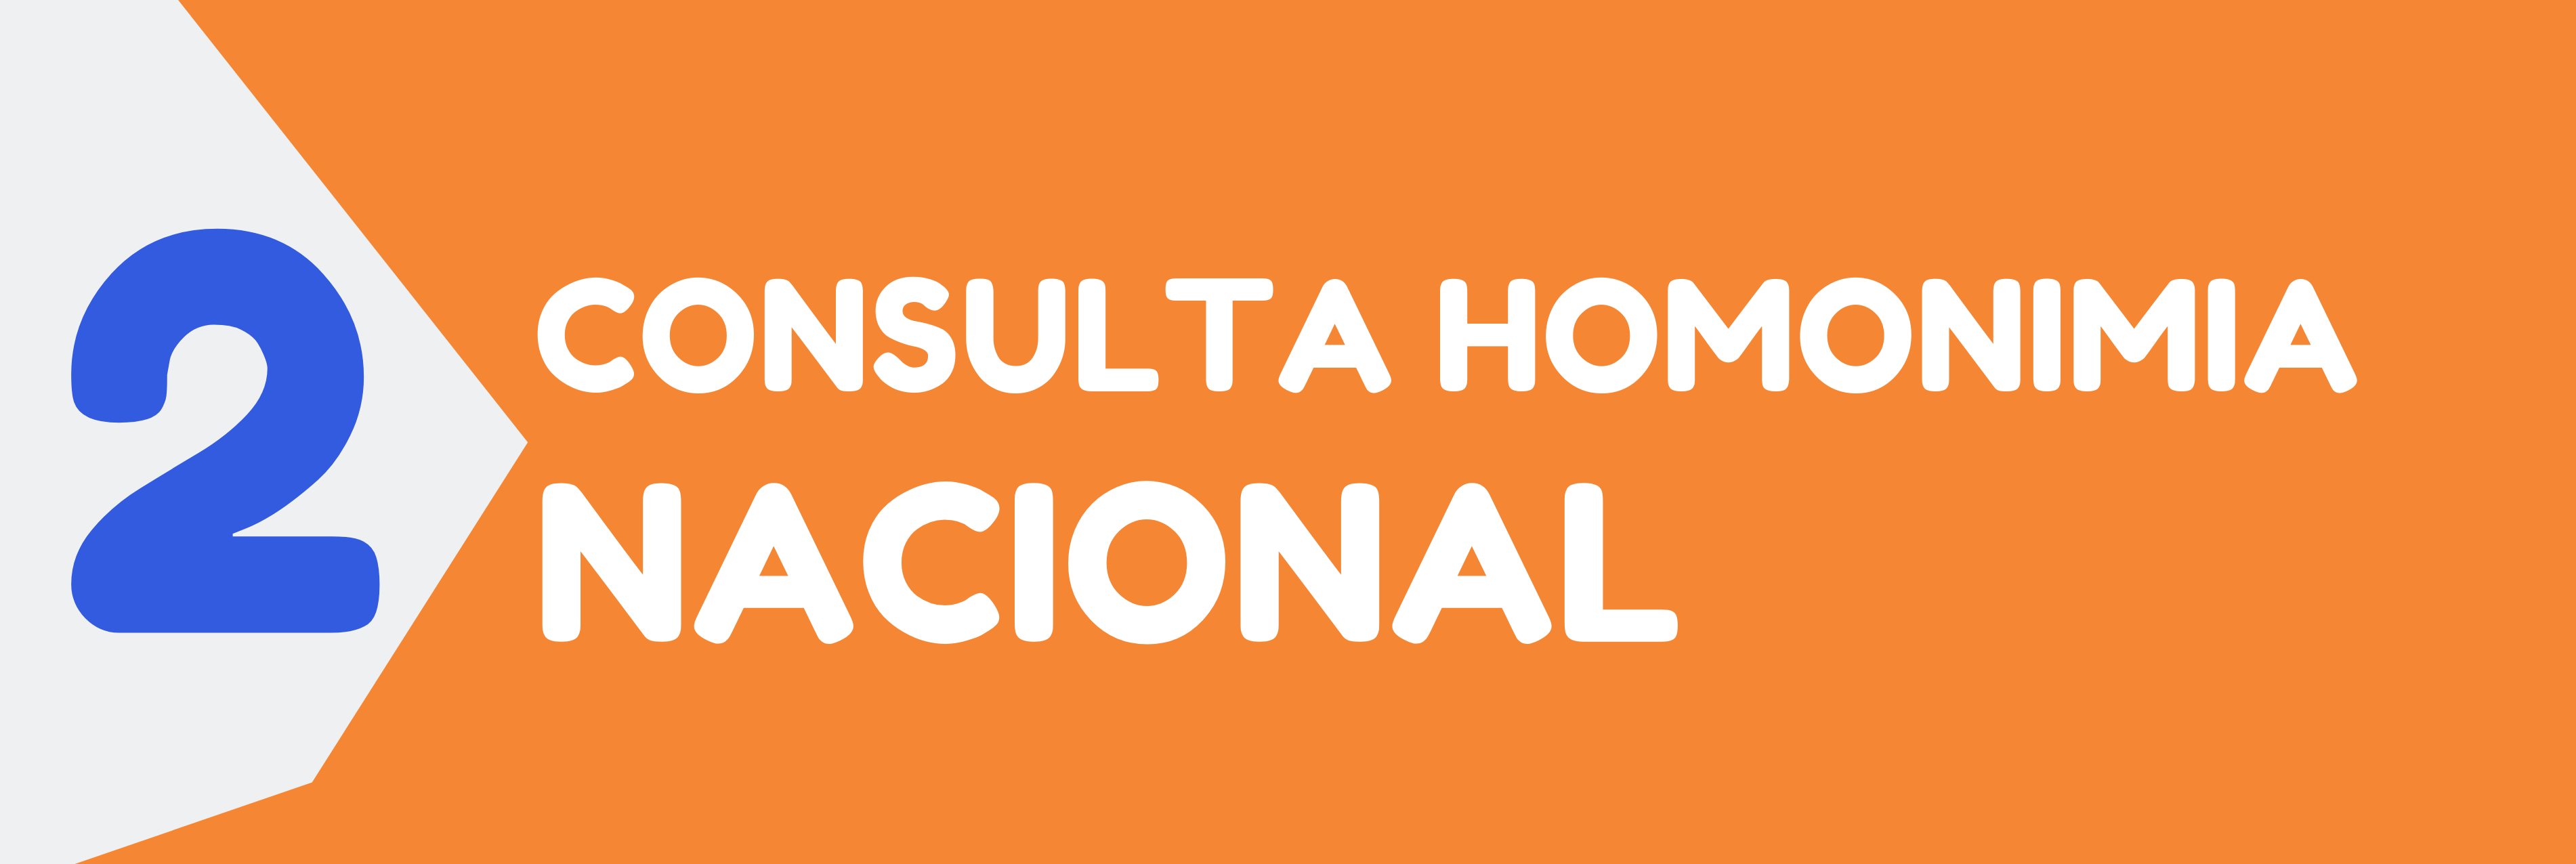 http://ccmagangue.org.co/media/imagenes/serviciosvirtuales/consultahomonimianacional